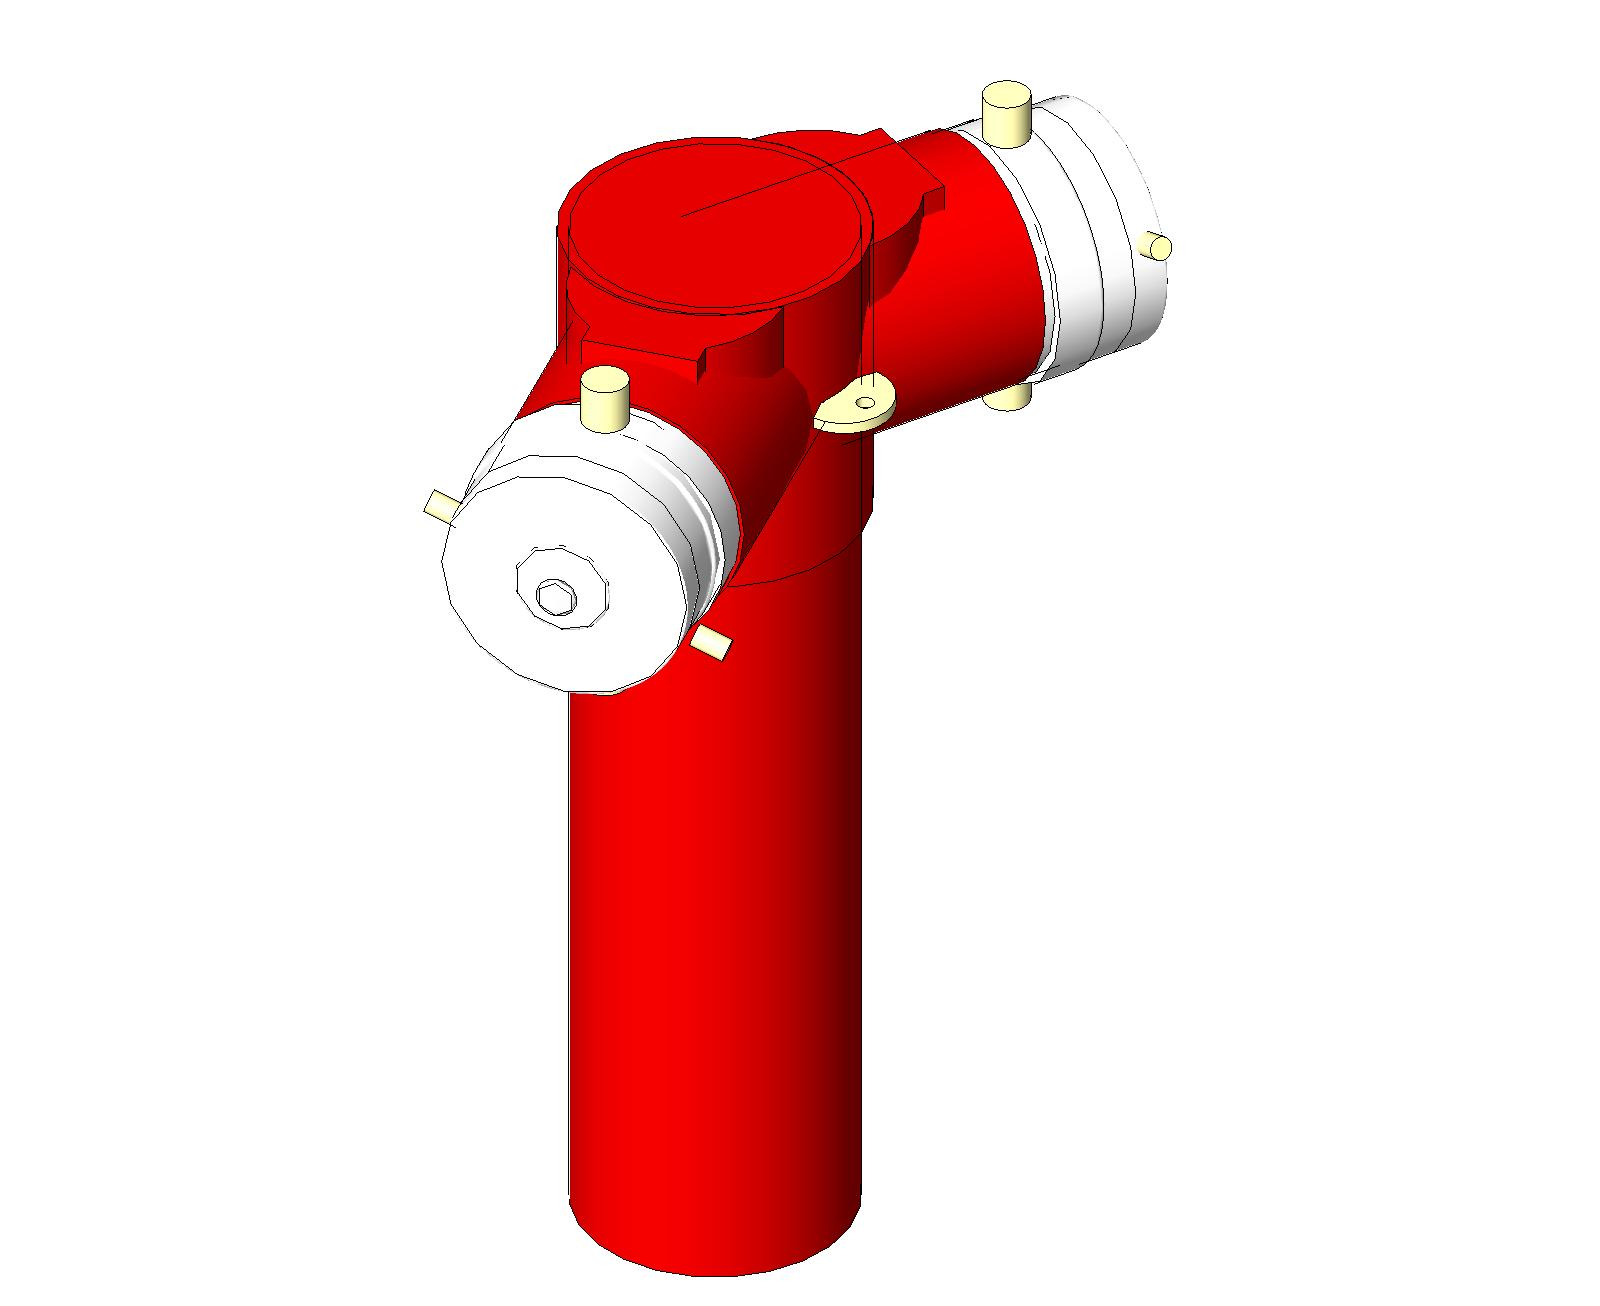 fire extinguisher symbol in autocad